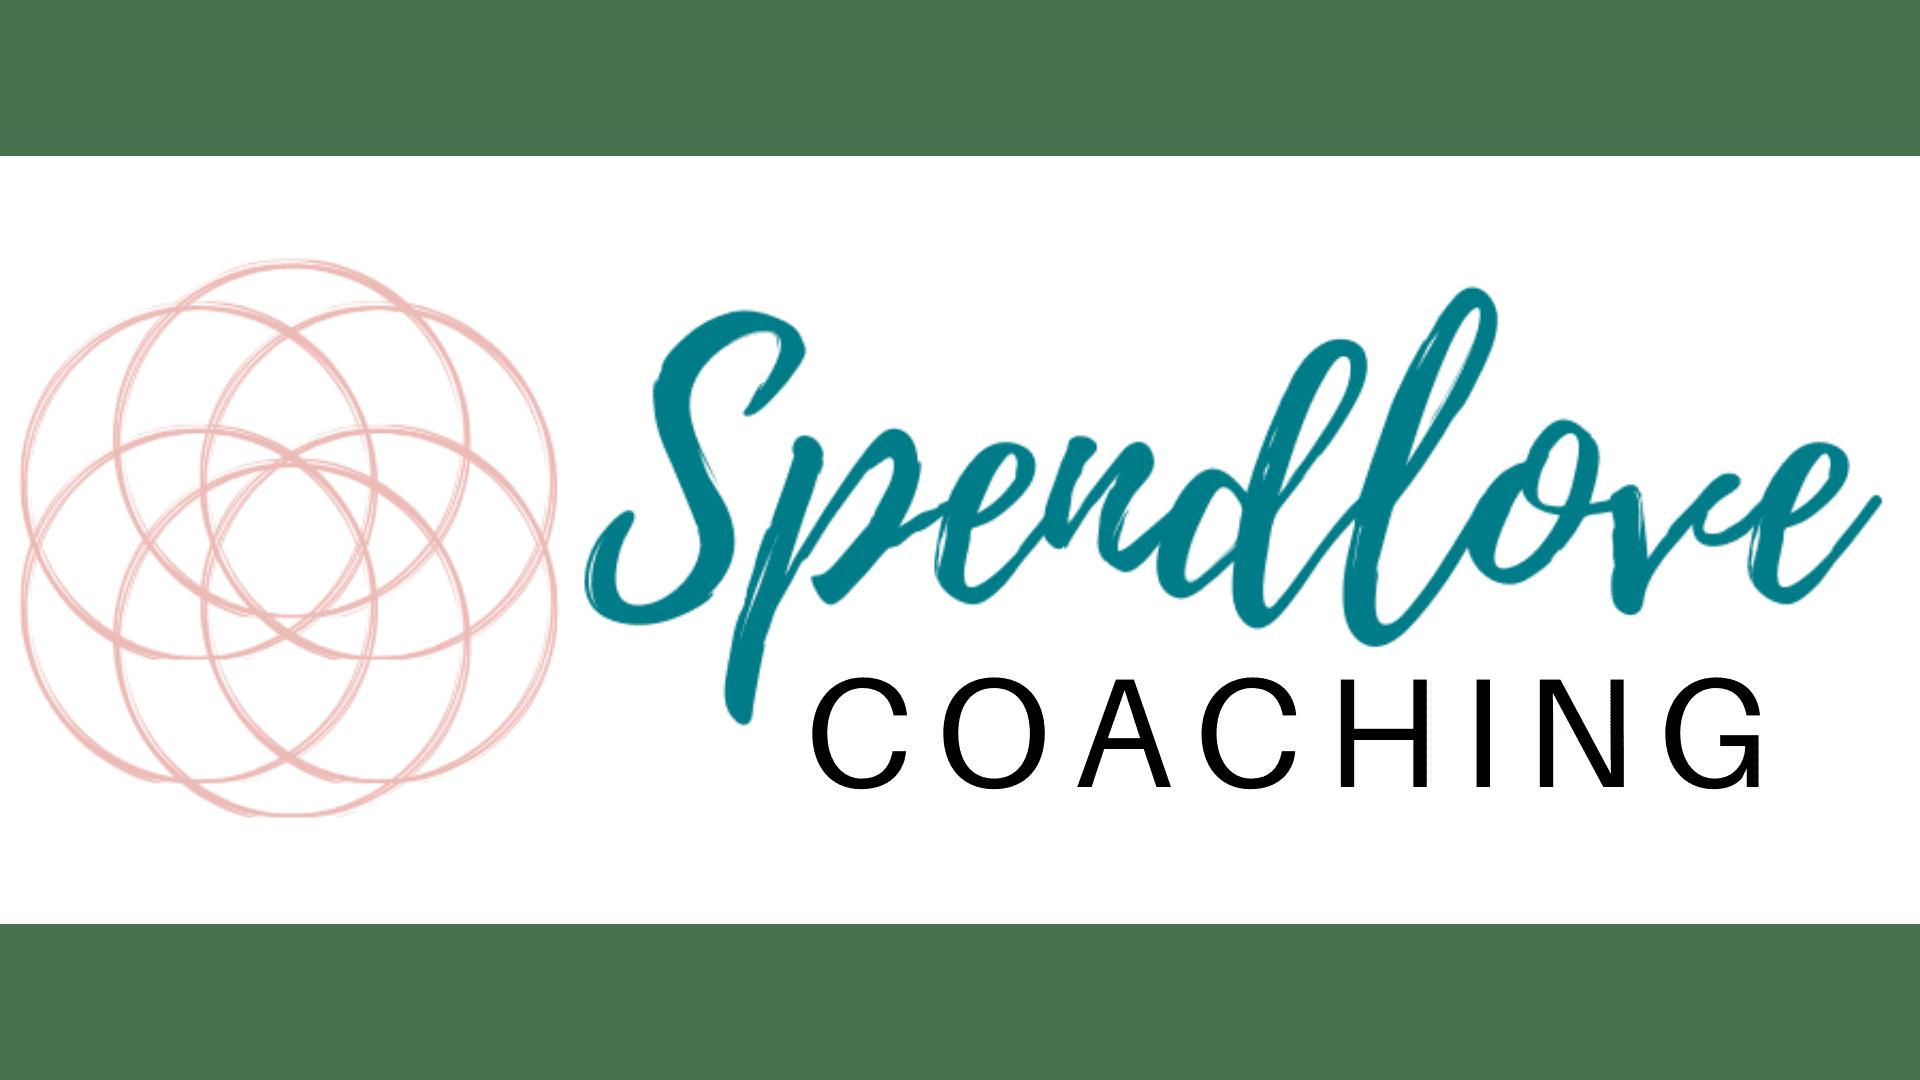 Spendlove Coaching